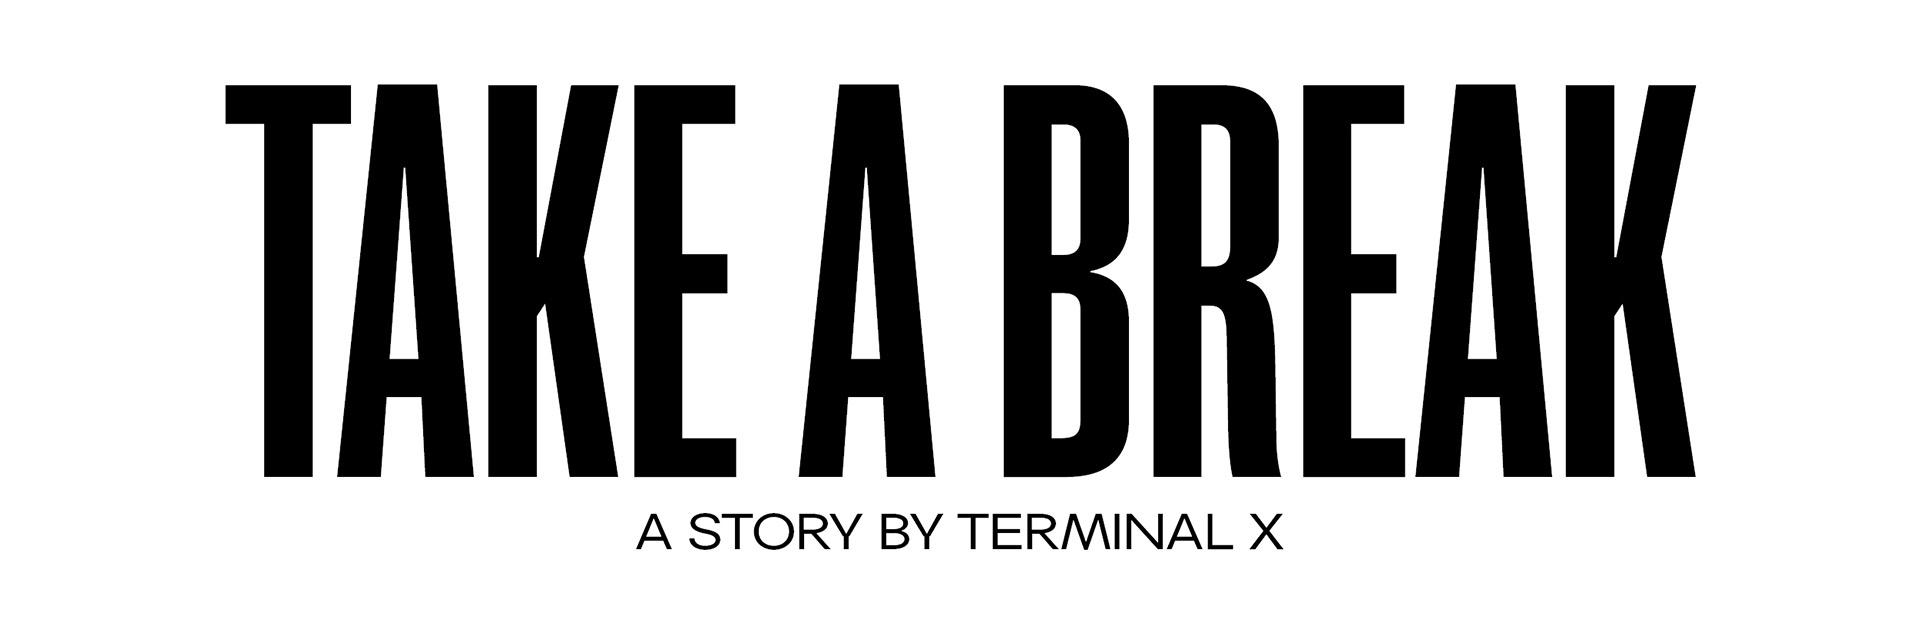 TAKE-A-BREAK-EDITORIAL